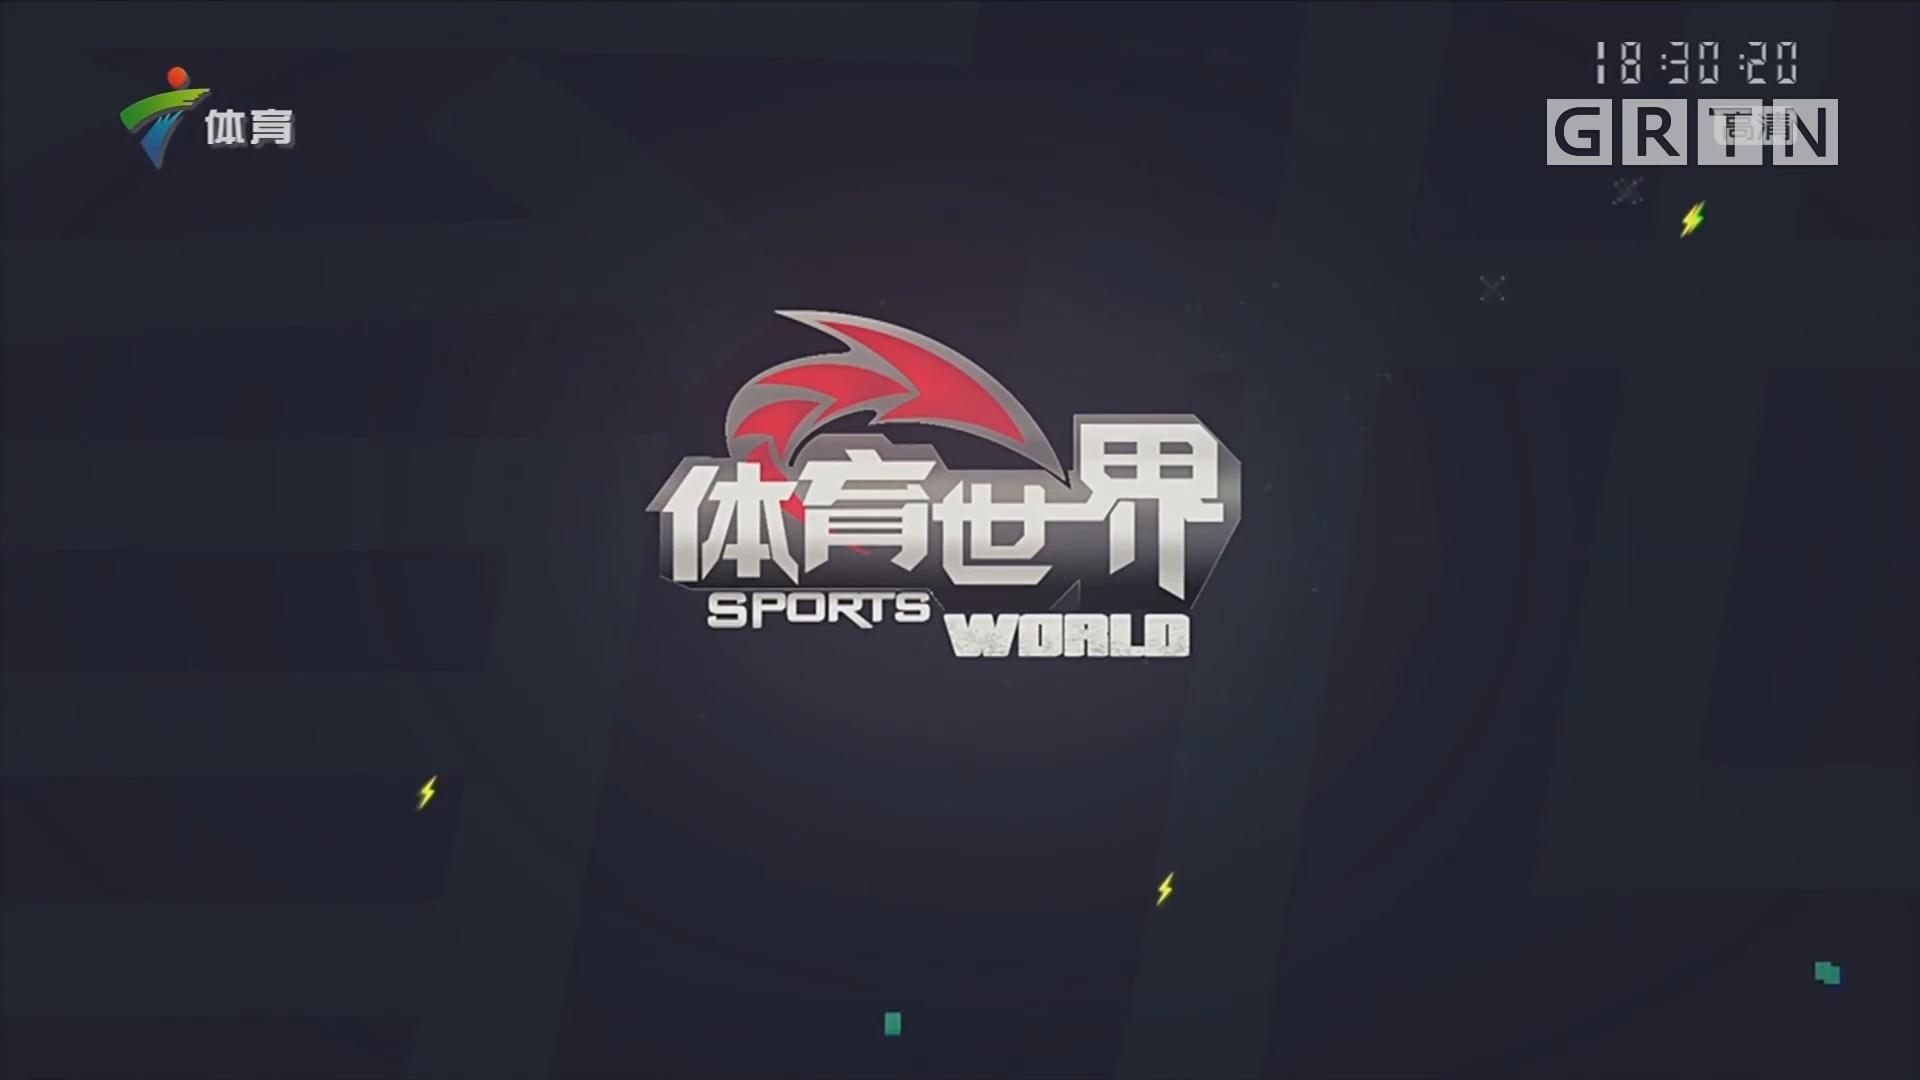 [HD][2018-08-13]体育世界:举重竞赛级别改变 广东先行一步